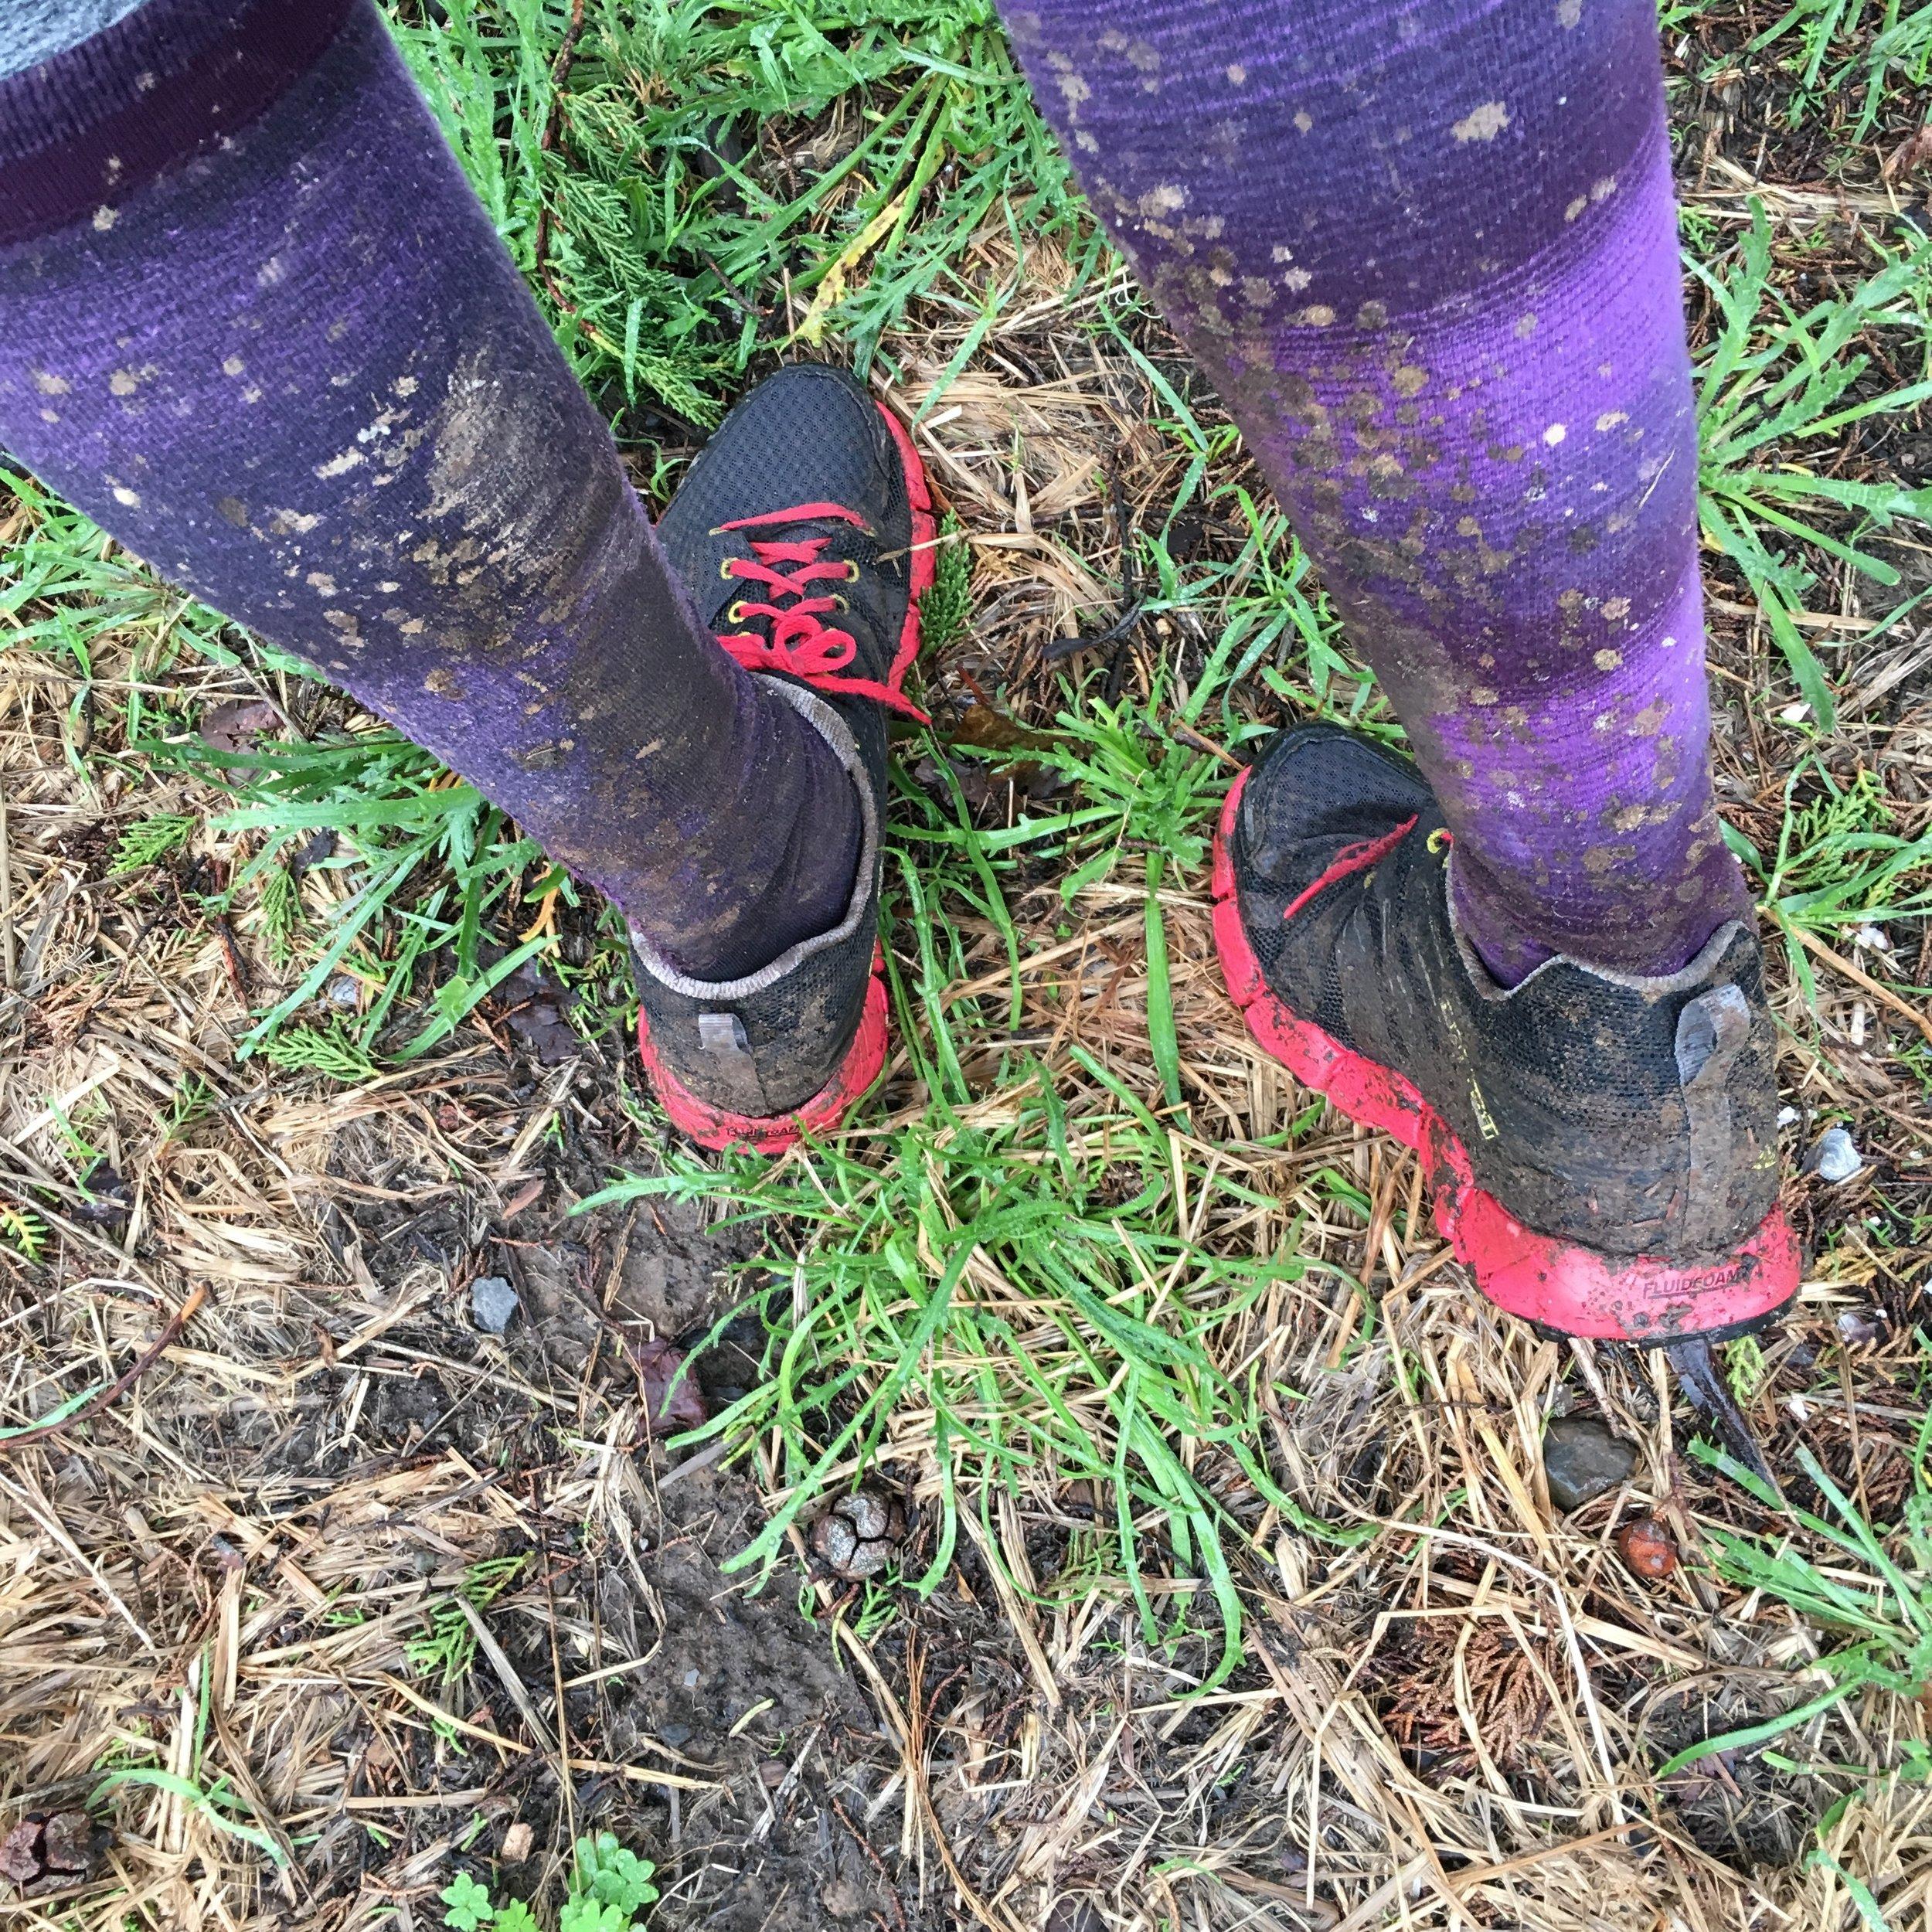 Muddy Aftermath of Steep Ravine 10K